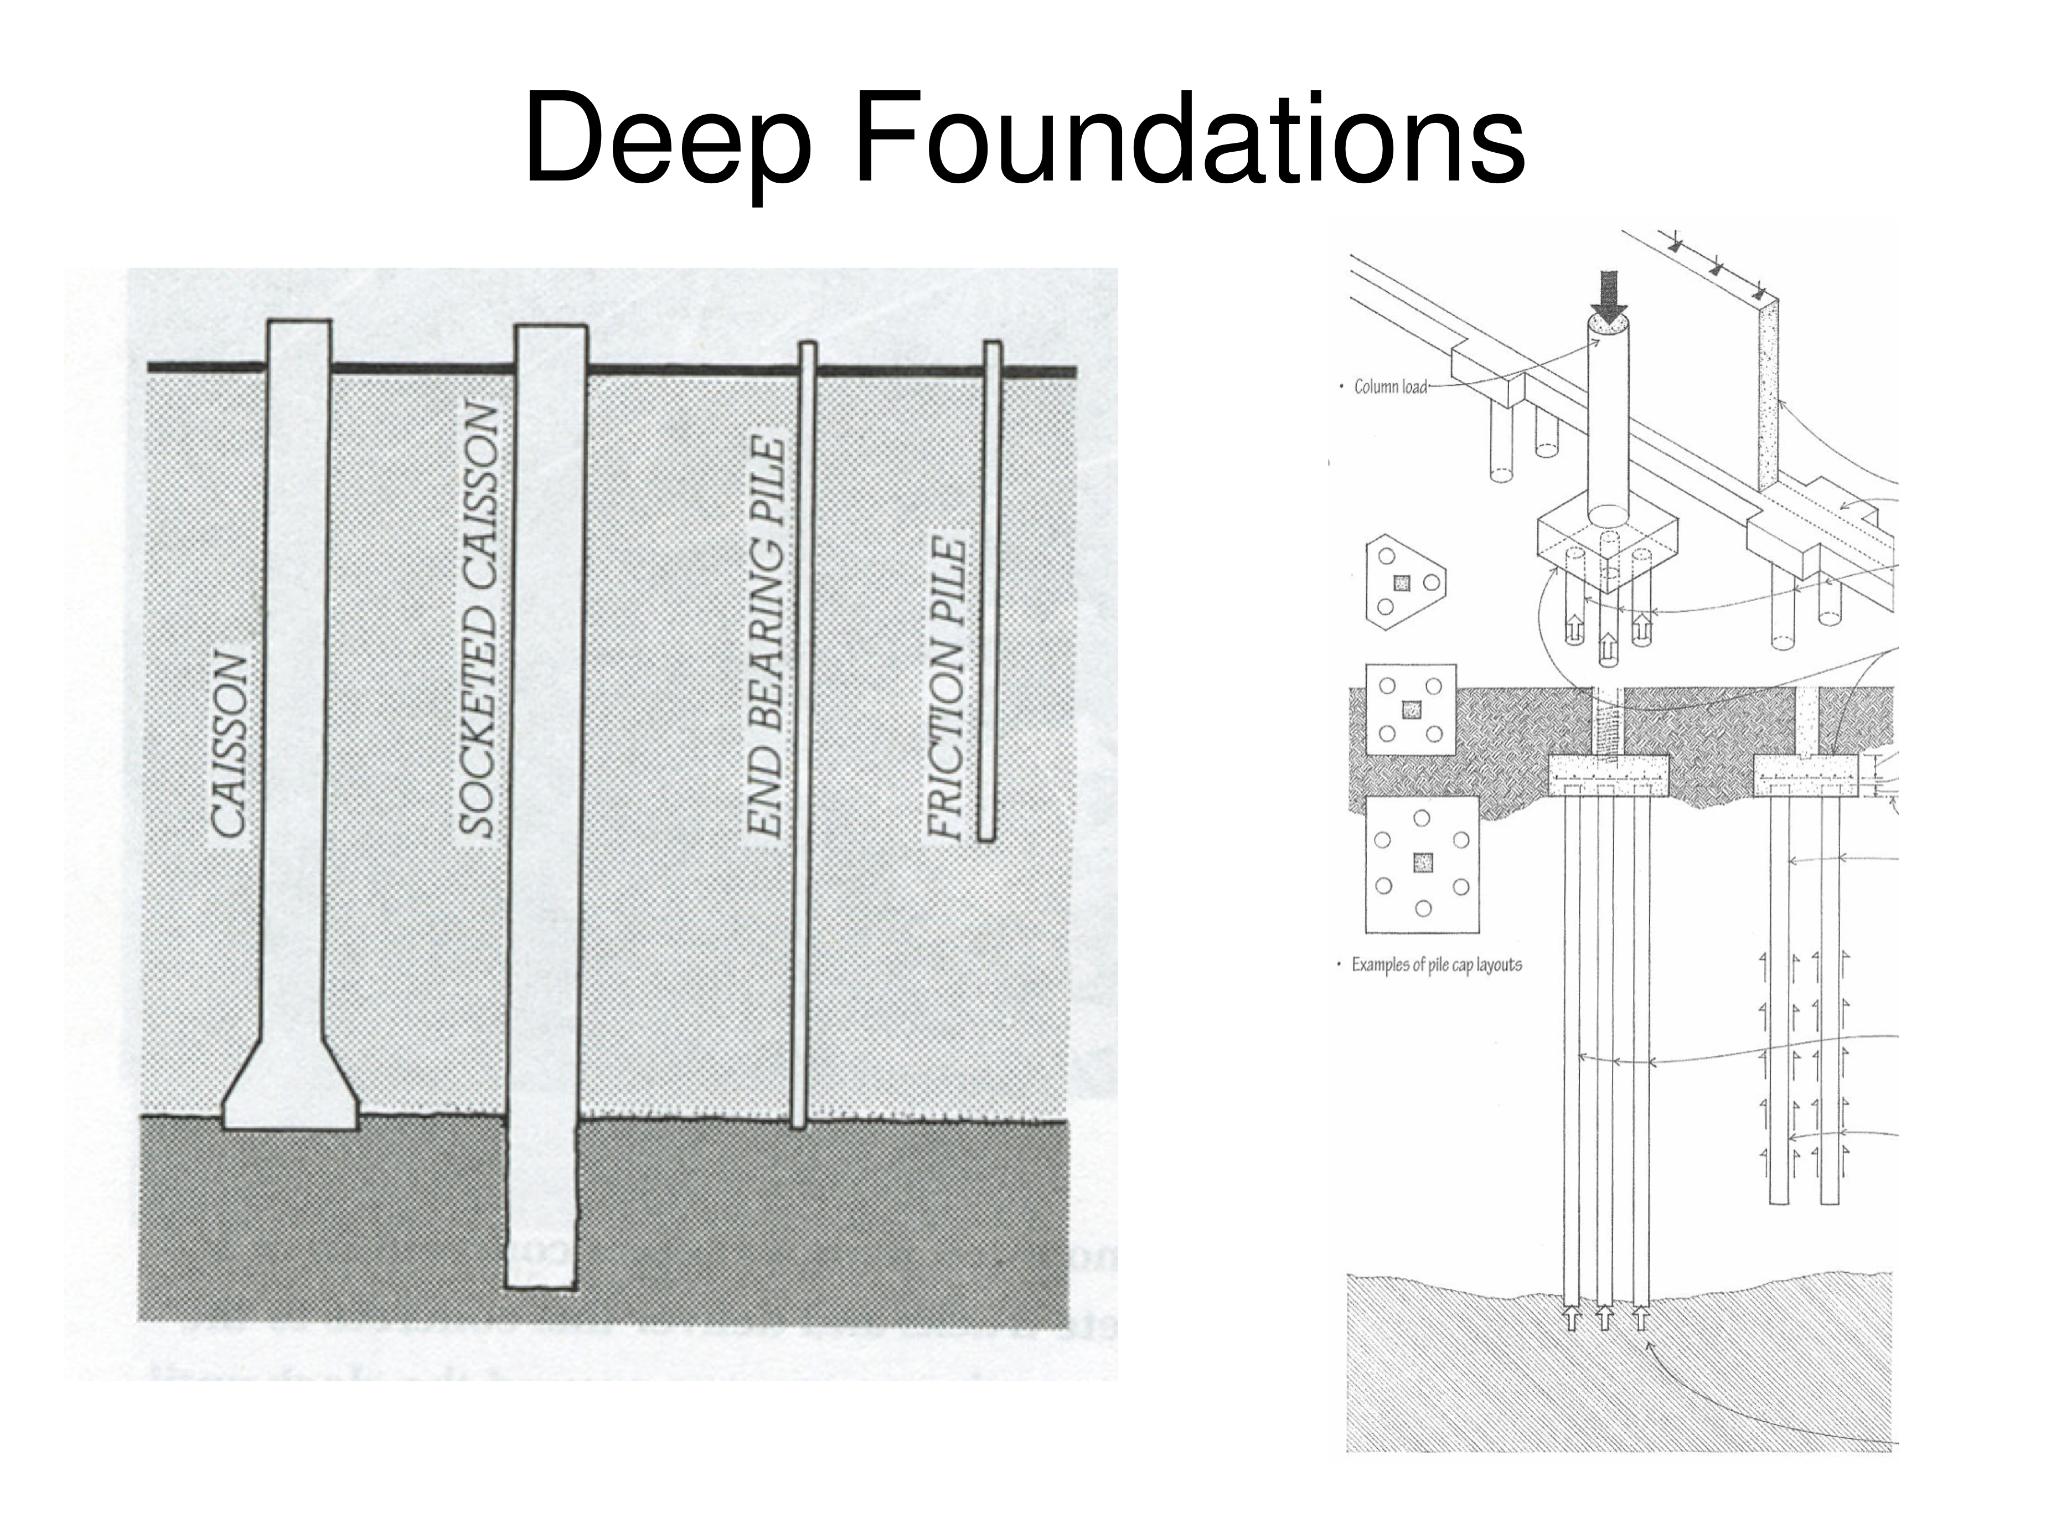 piles vs caissons soils and foundations pinterest. Black Bedroom Furniture Sets. Home Design Ideas